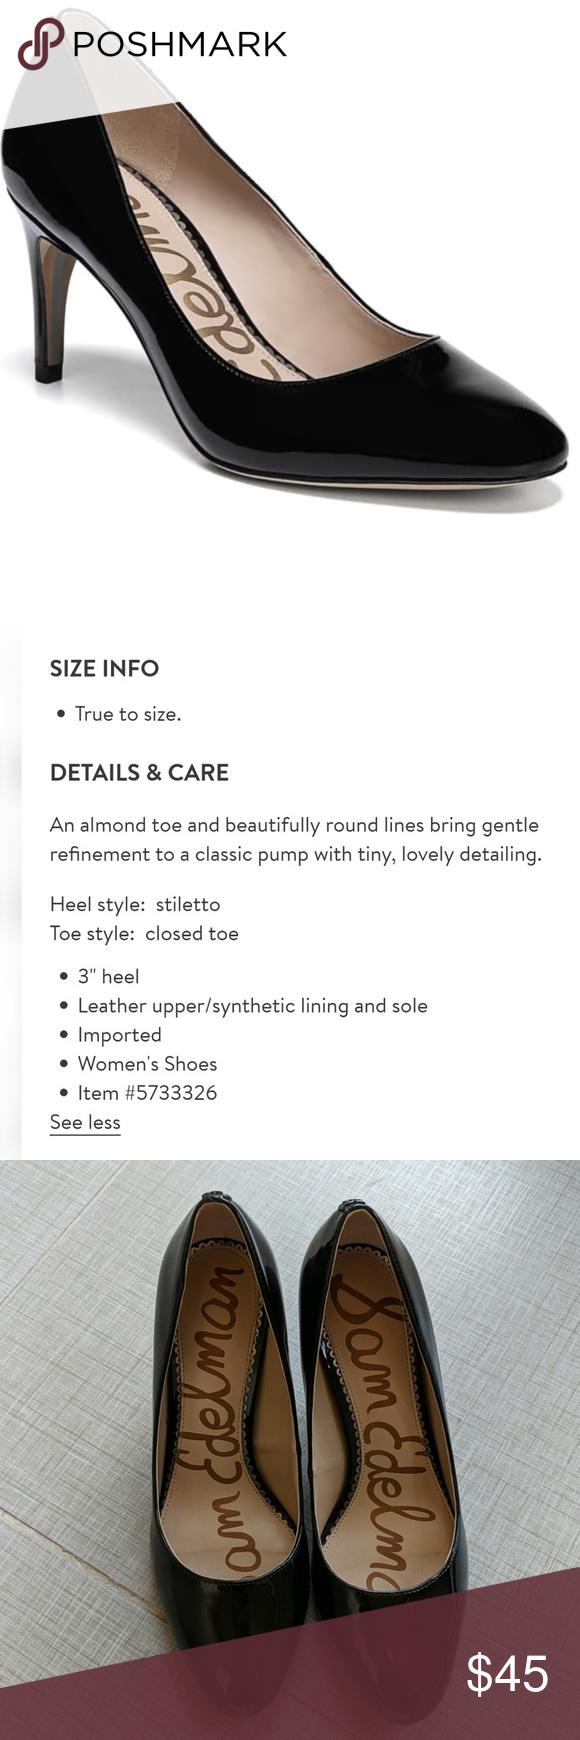 06b55fb0b Sam Edelman  Elise  Pumps Sam Edelman  Elise  Pumps in black patent  leather. Great overall condition